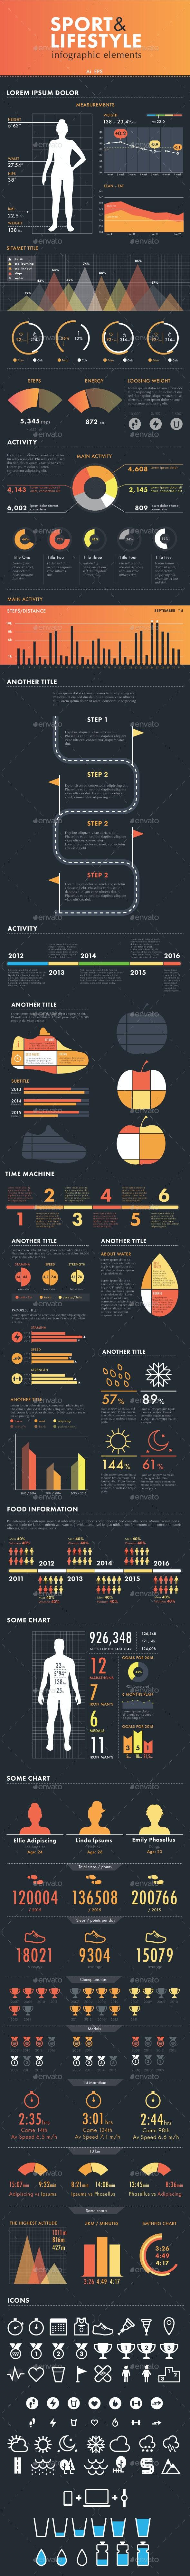 Sport & Lifestyle Infographic Set - Infographics